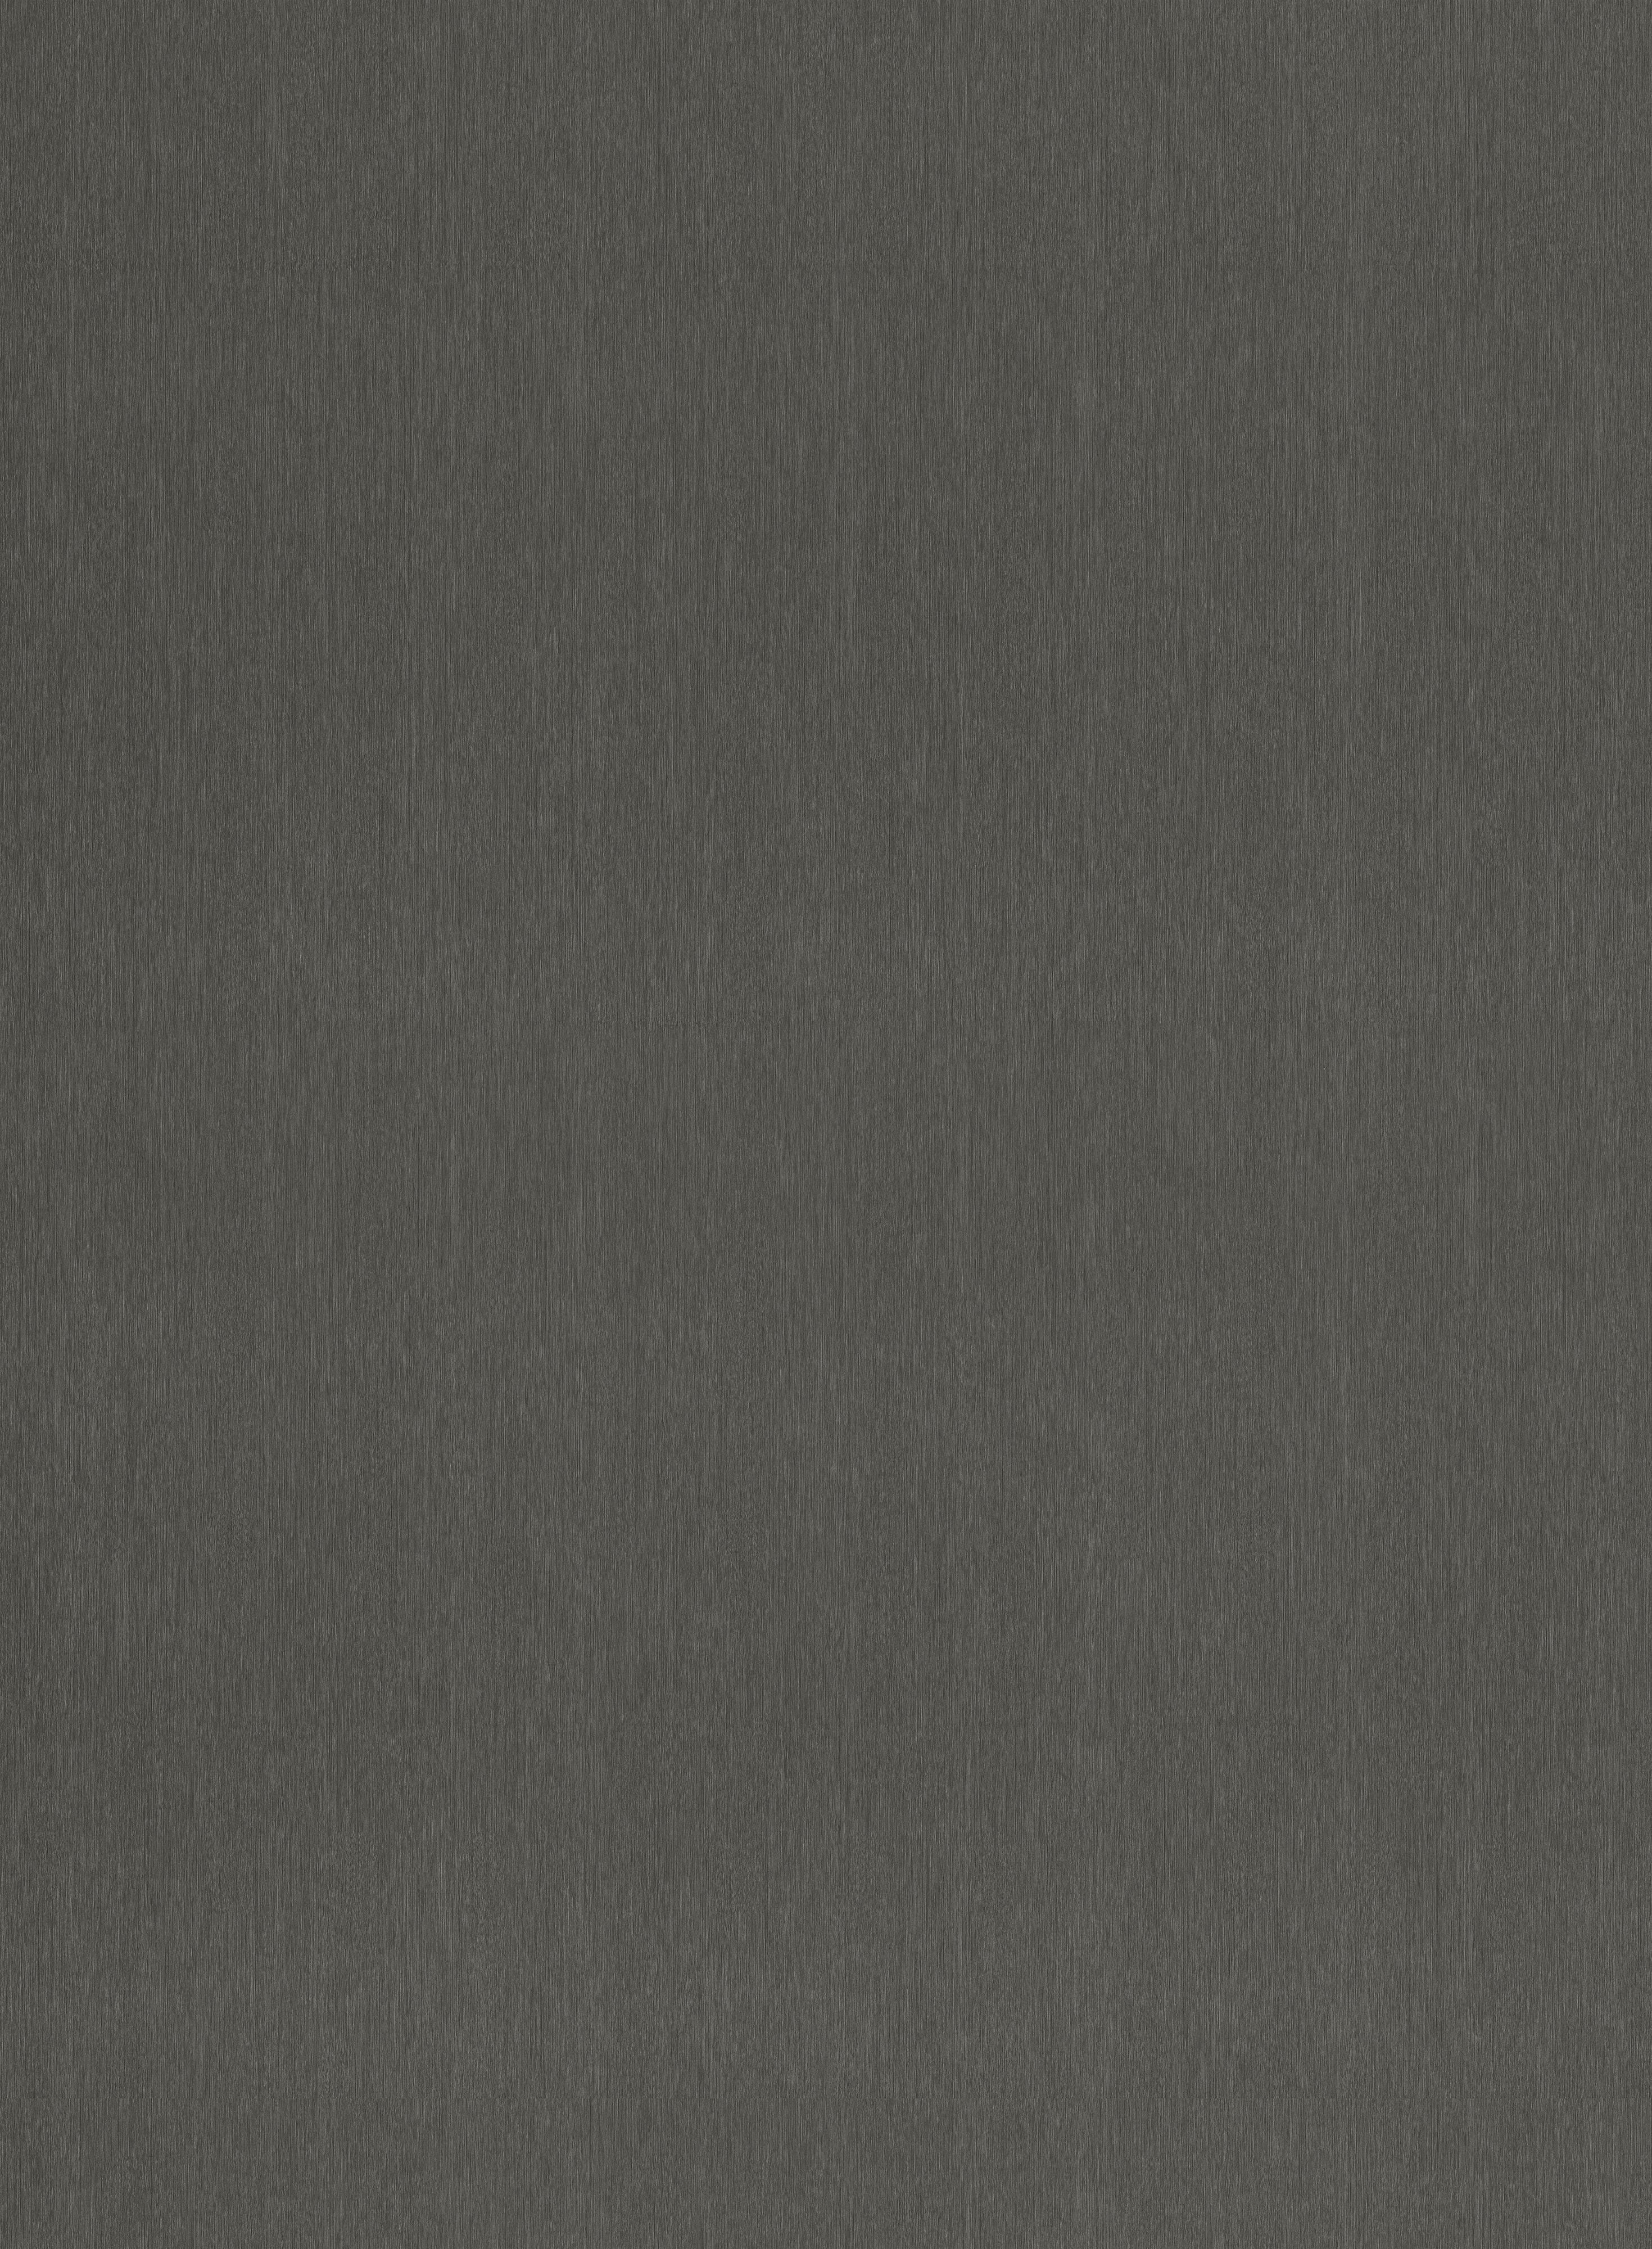 DecoLegno FB30 Reflex hele plaat afb. 2800x2070 mm / Tekenprogramma